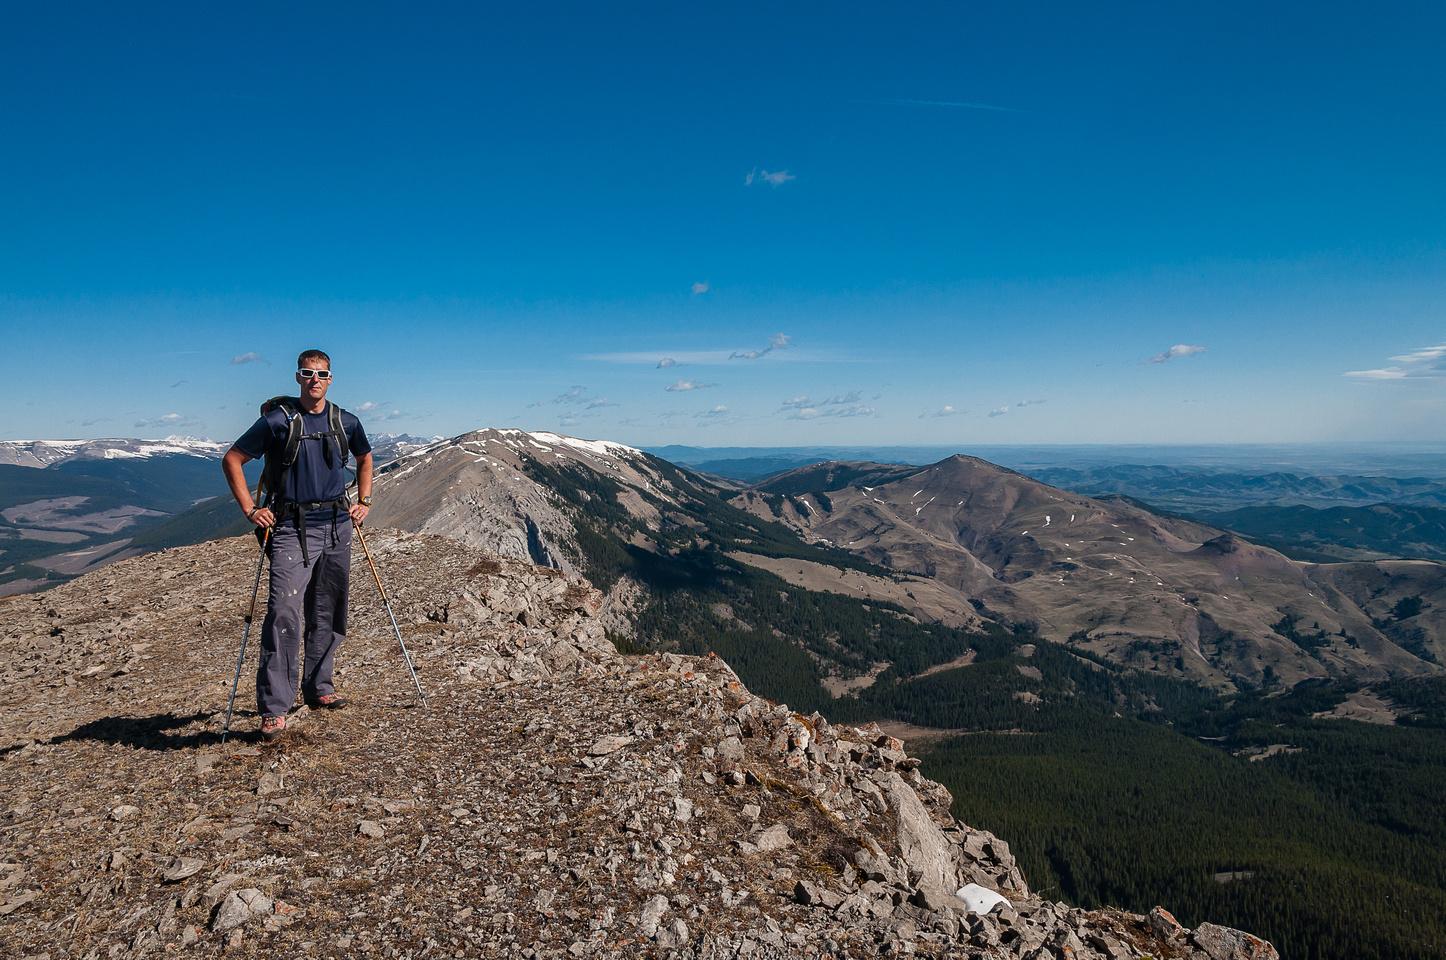 On the summit of Coffin Mountain.